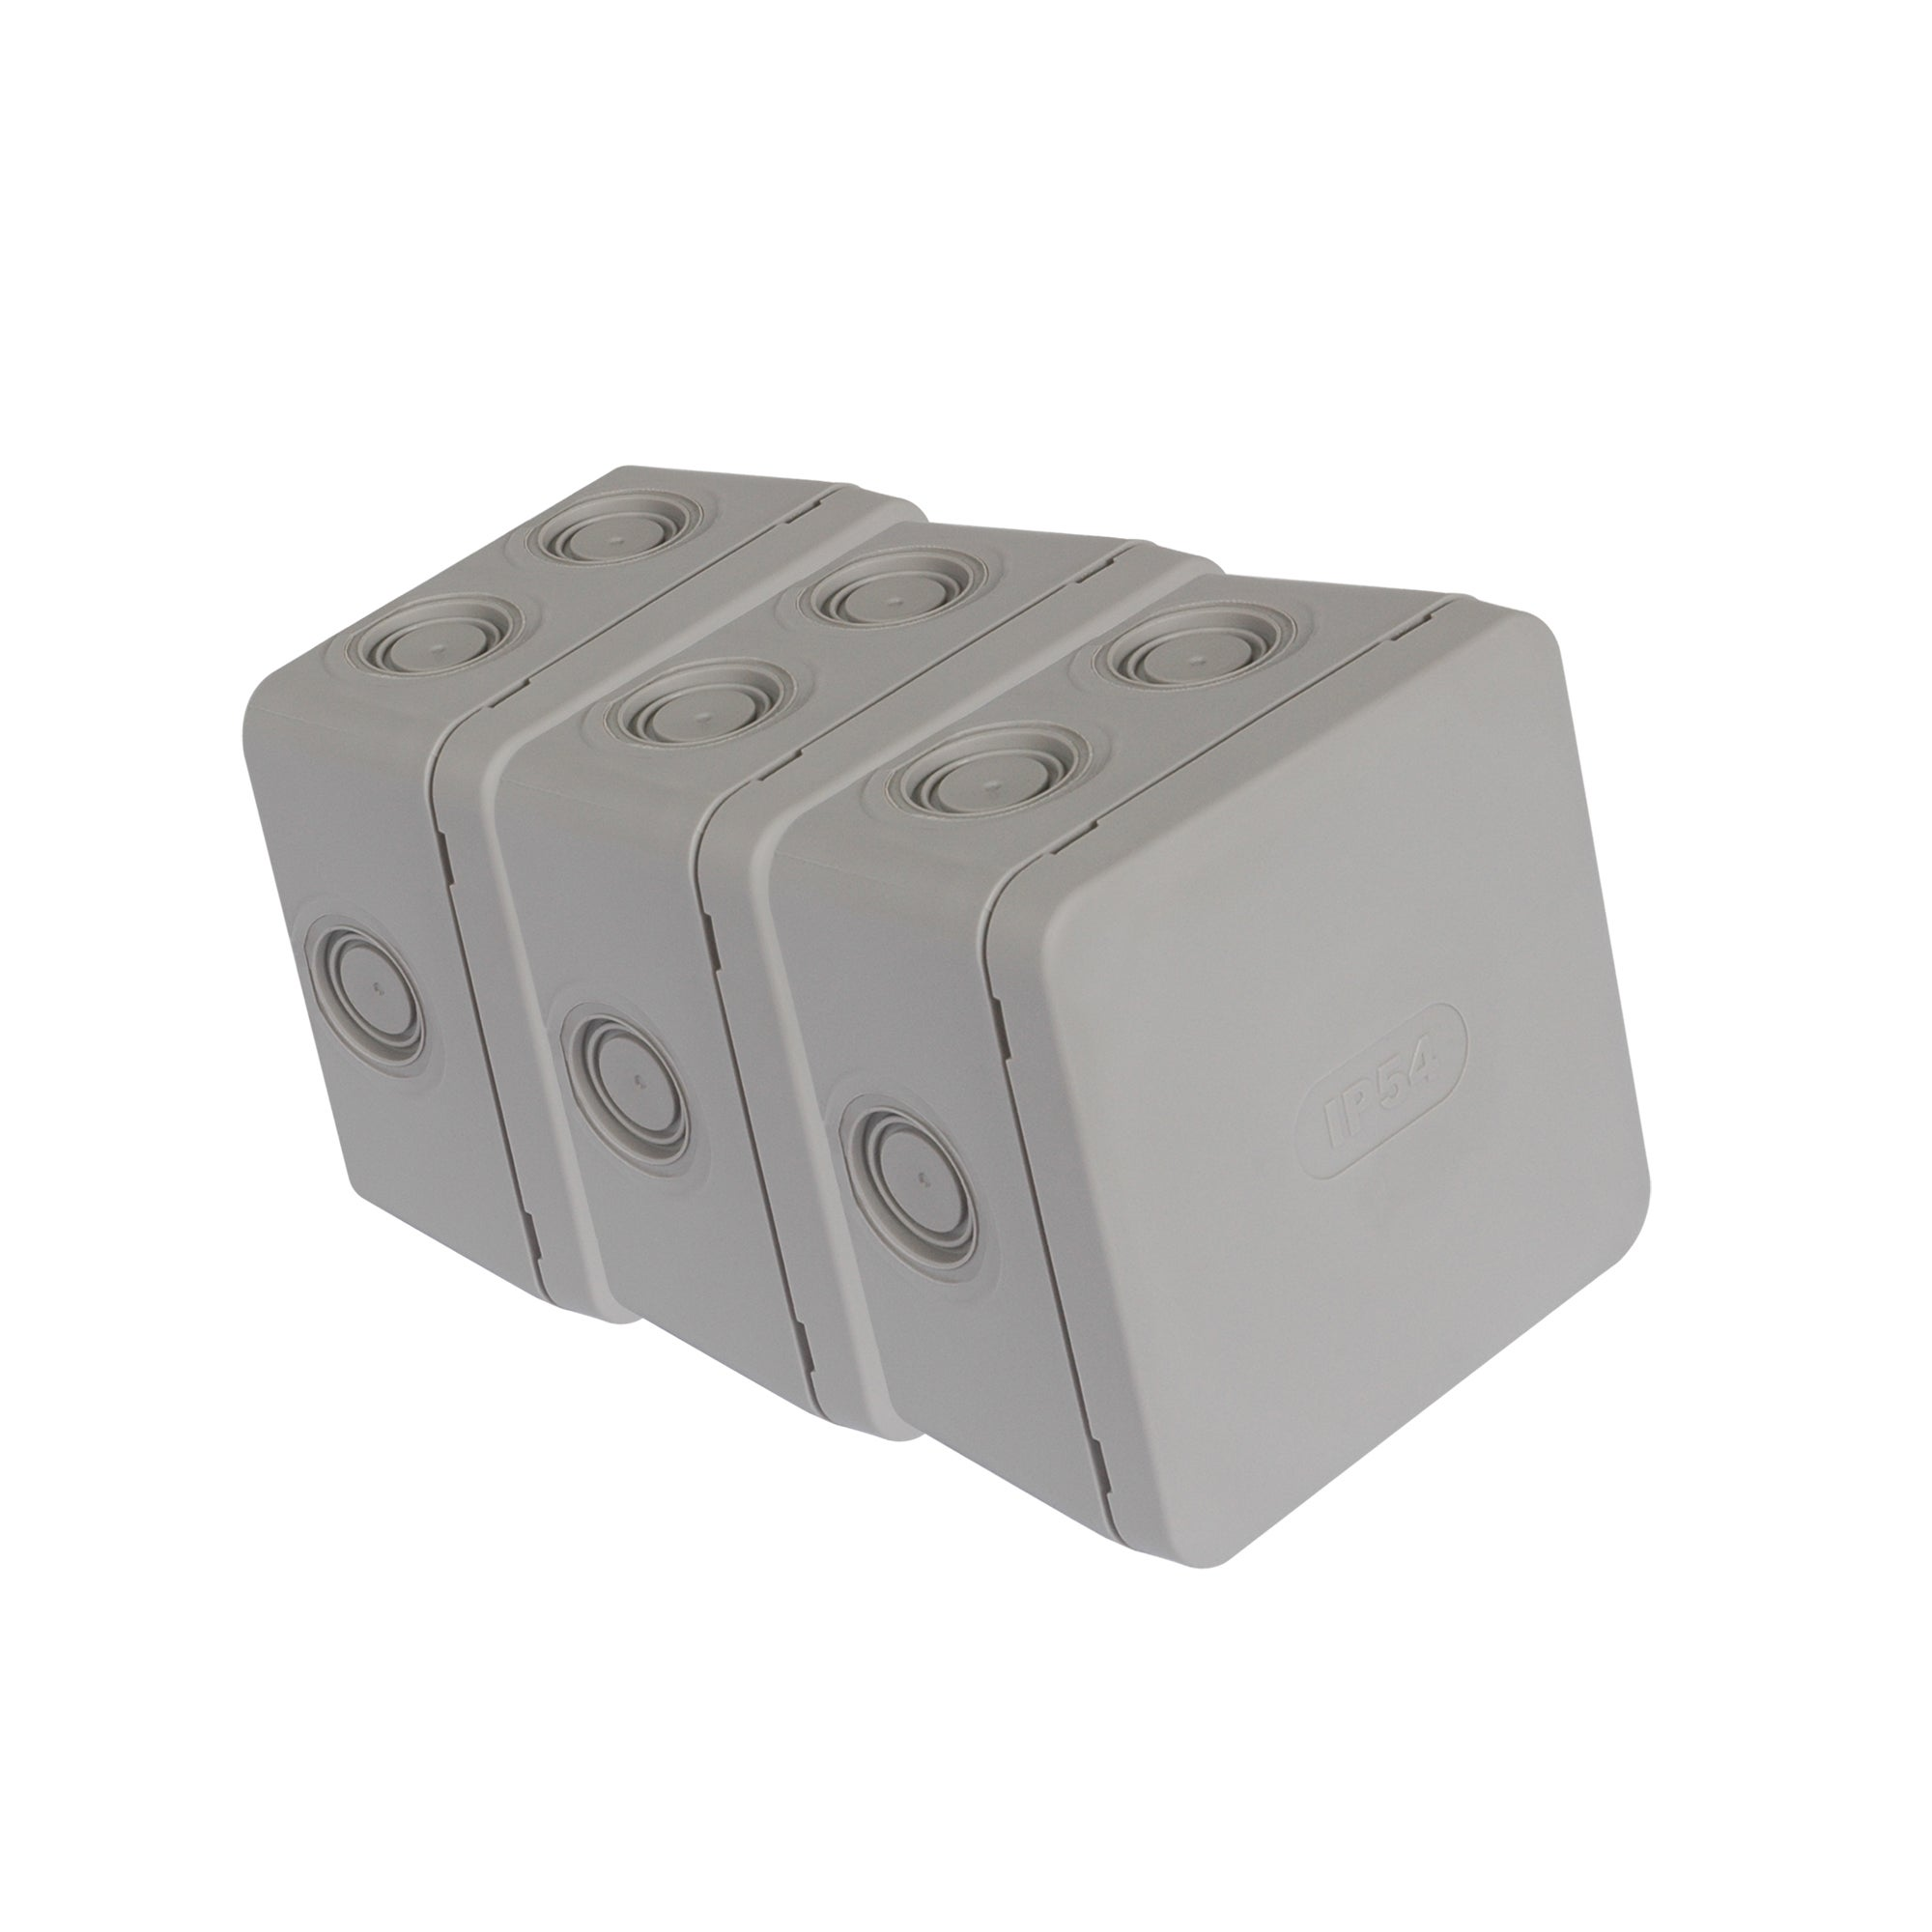 DEBFLEX Boite Derivation IP55 115x115x55